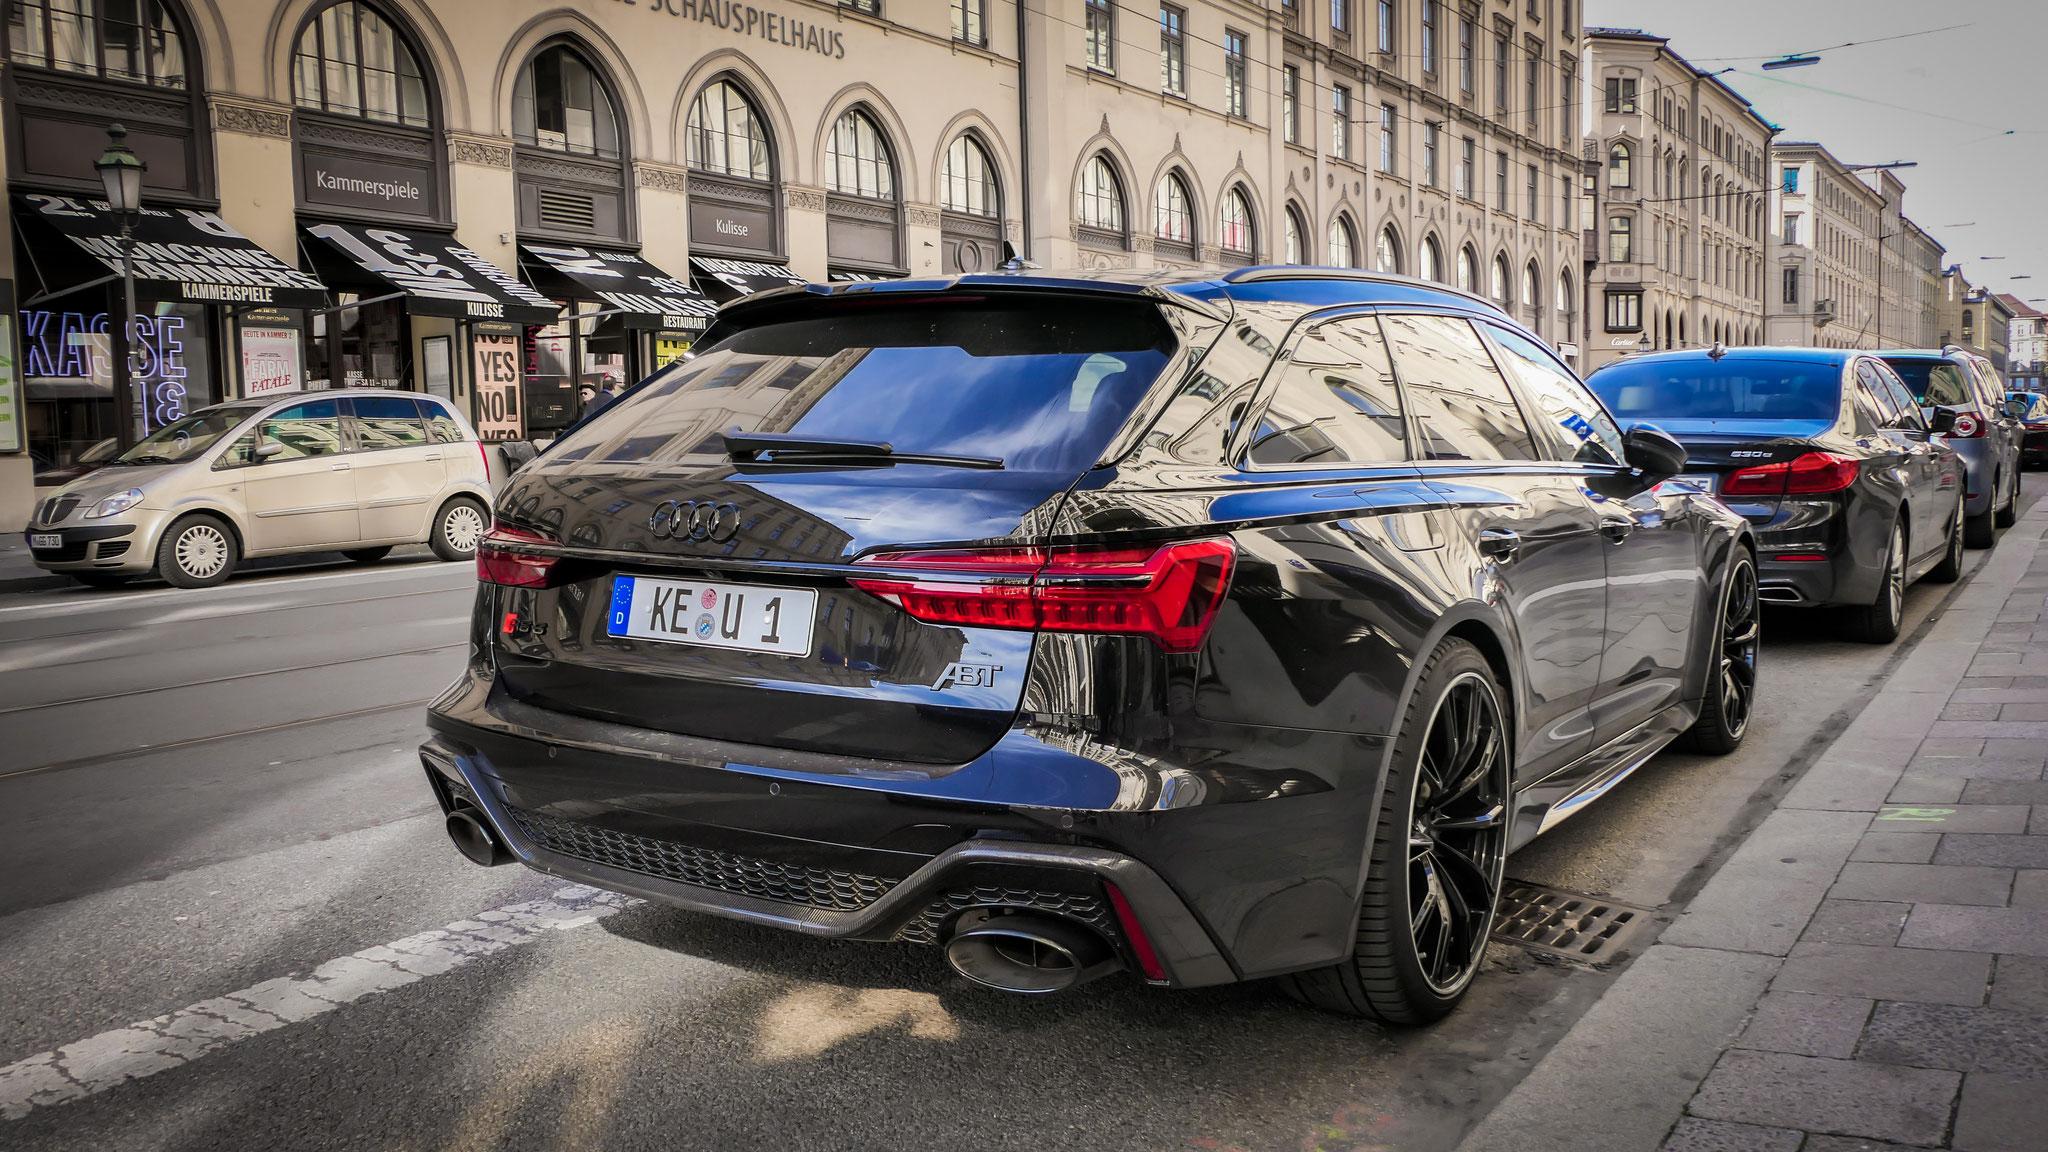 Audi RS6 Abt - KE-U-1